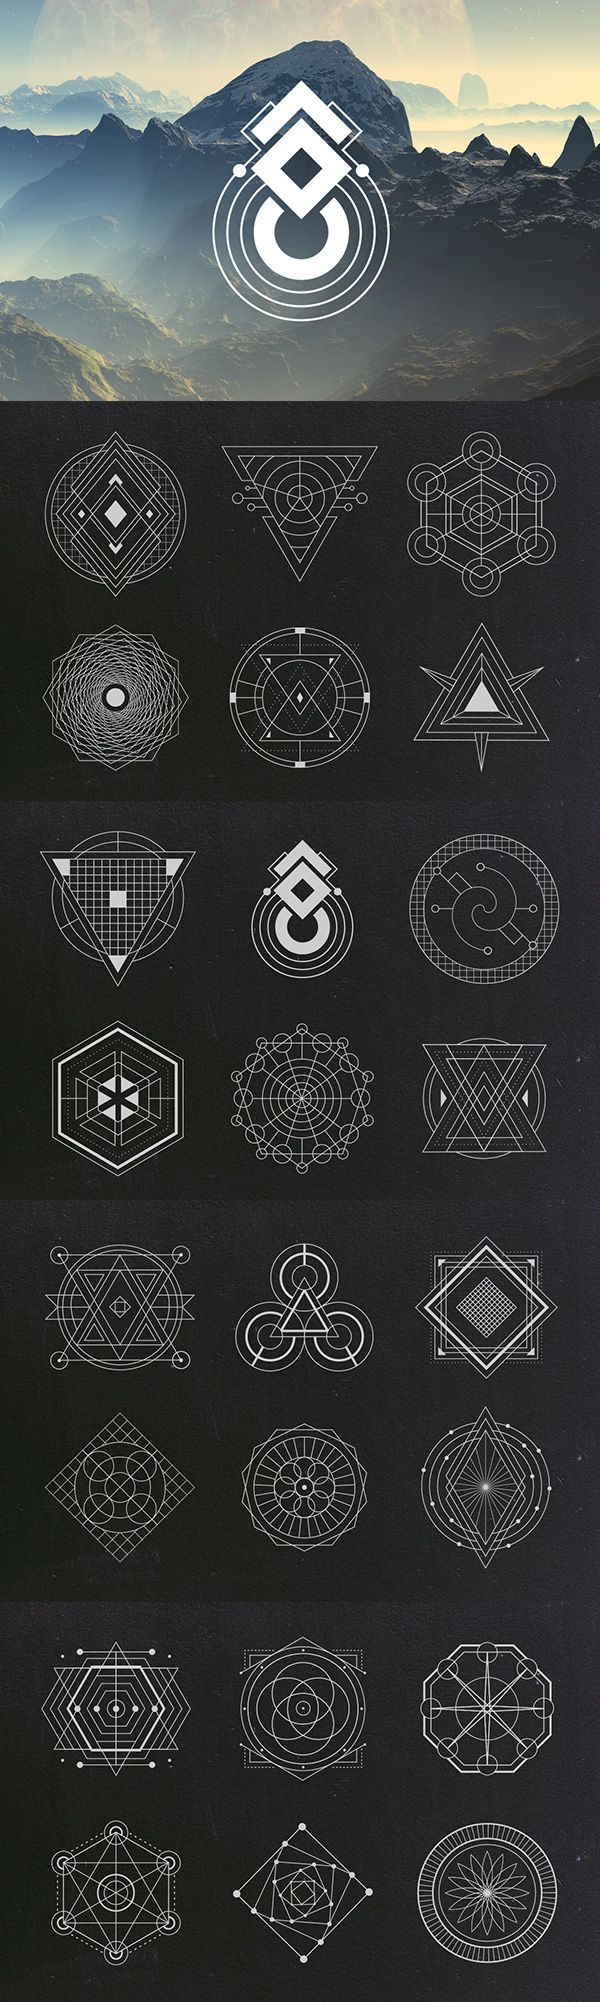 Sacred Geometry Vectors | Graphic Design Elements | Geometric Vector Clipart Images | Blog Graphics | Web Design | Branding Niche | Blogging | Business | Art